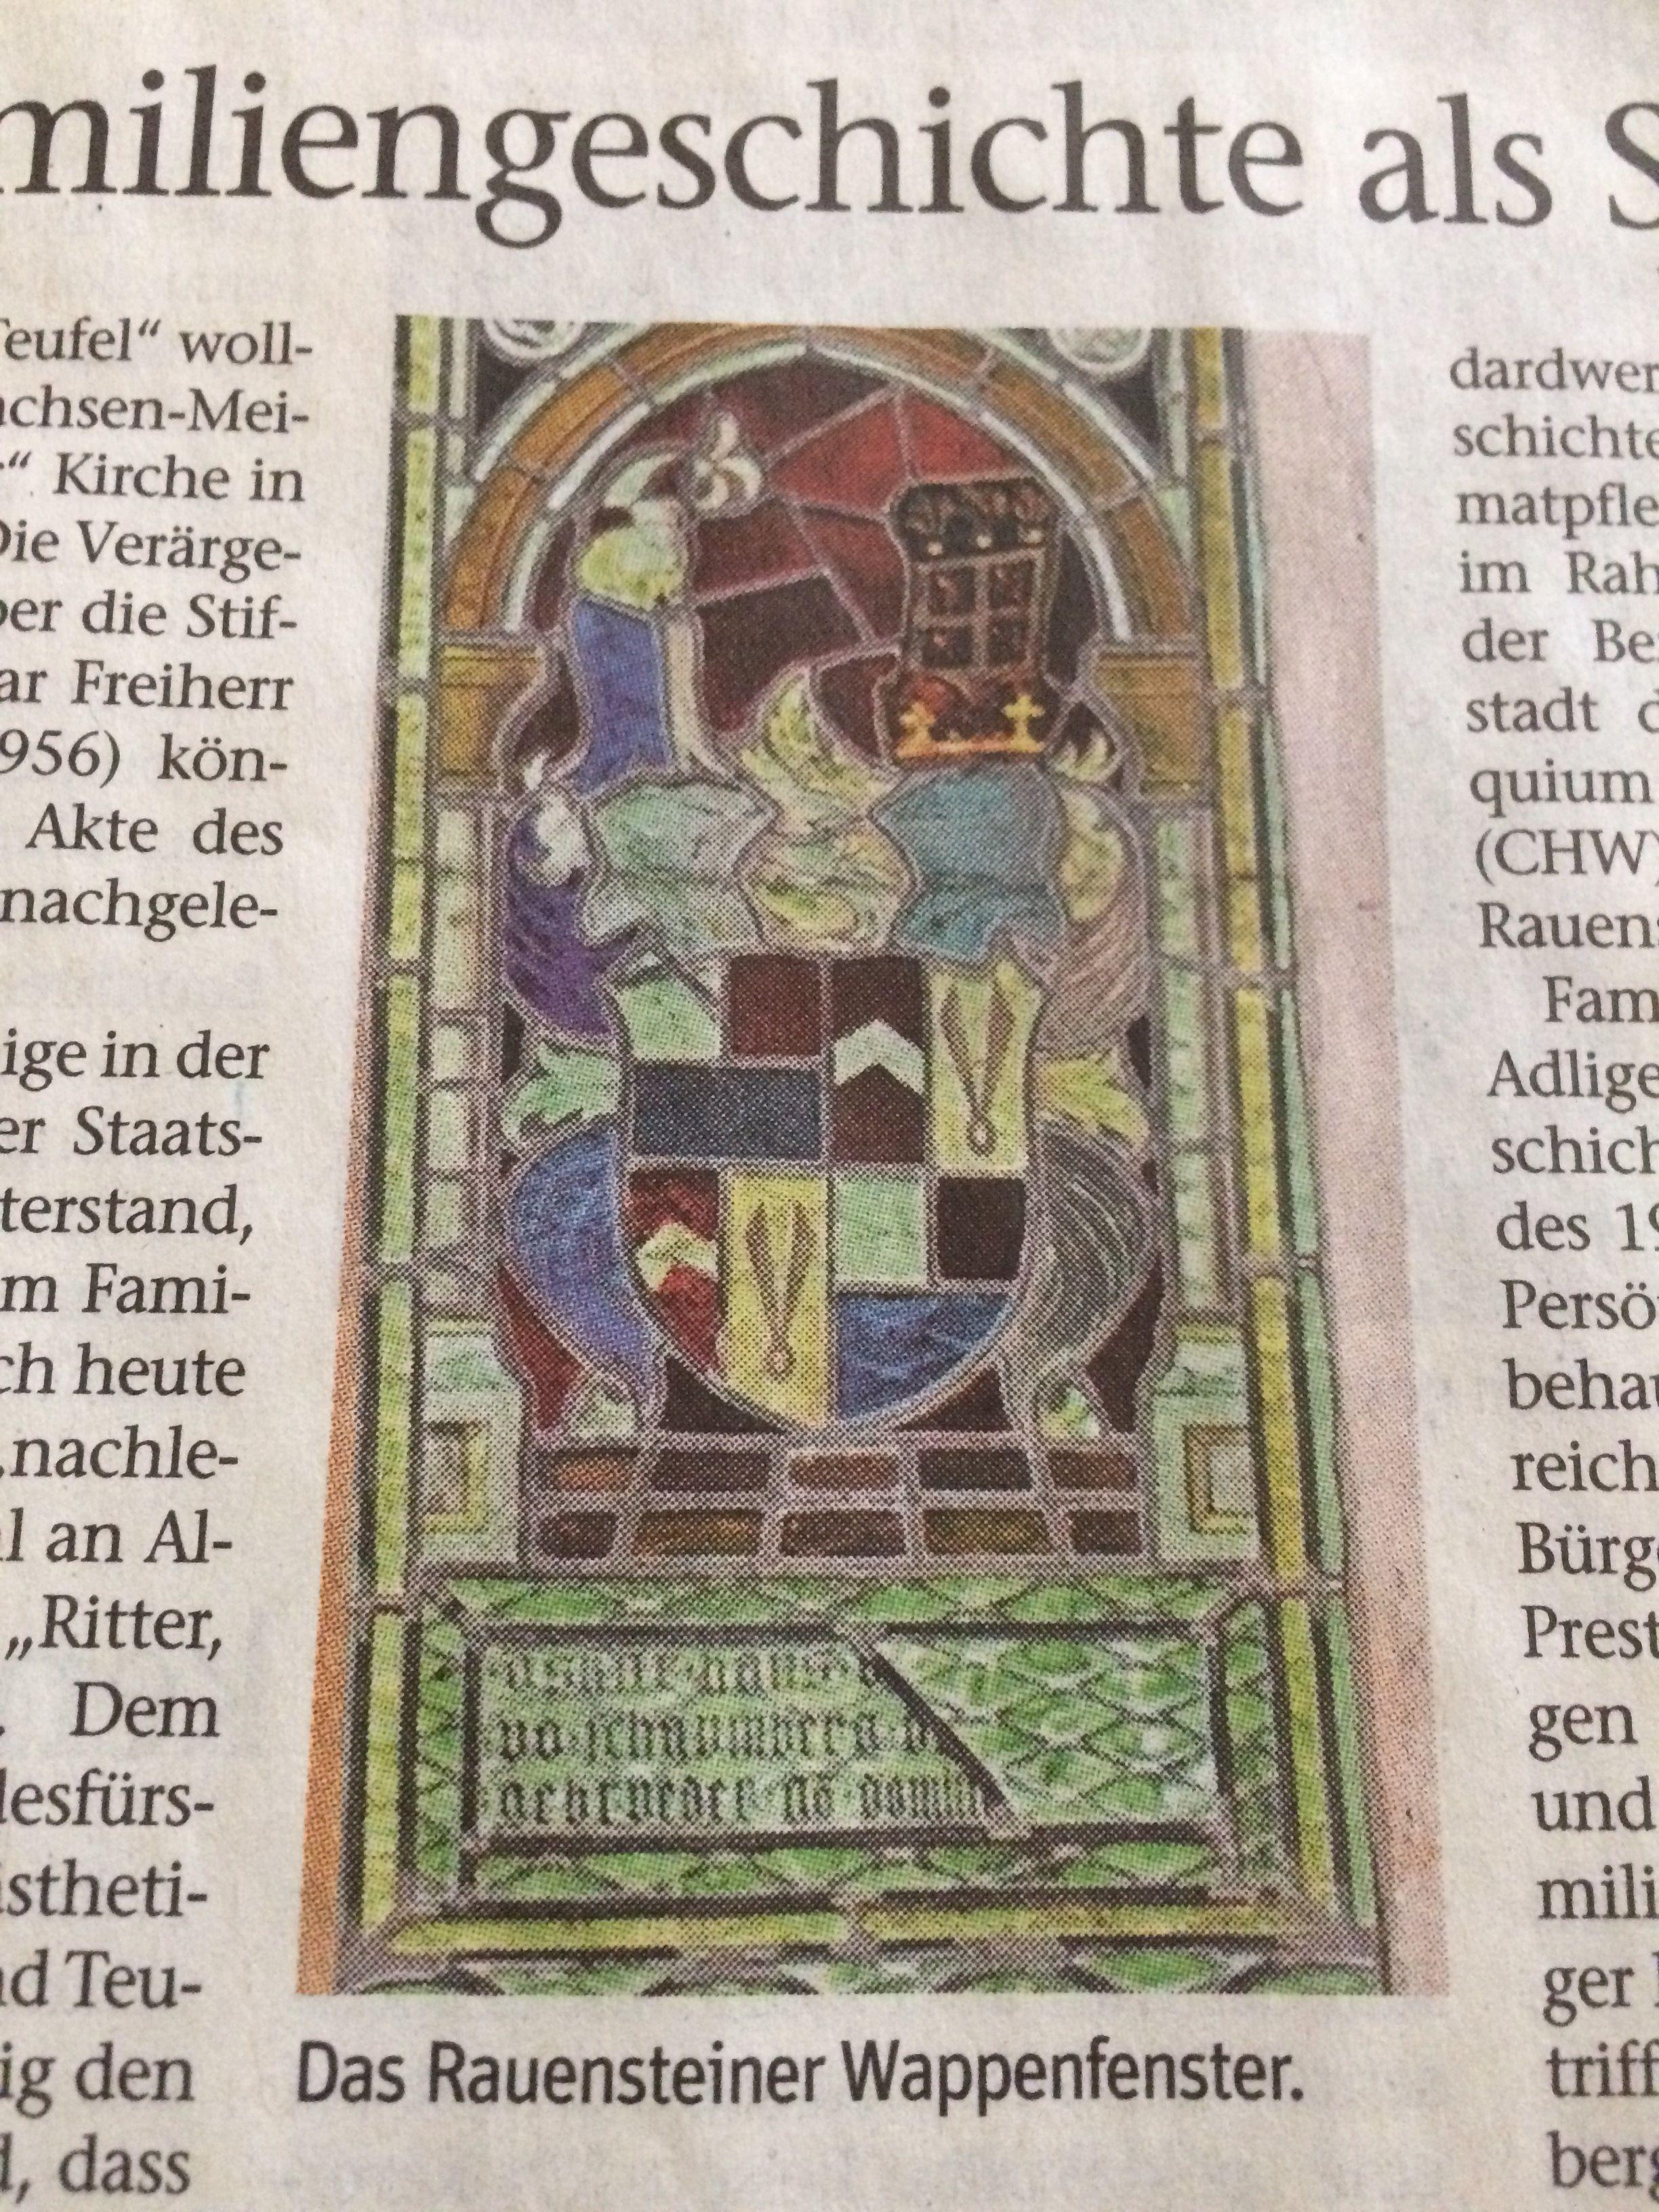 Pin By Angelika Hausdörfer On Kulturelle Veranstaltungen | Pinterest